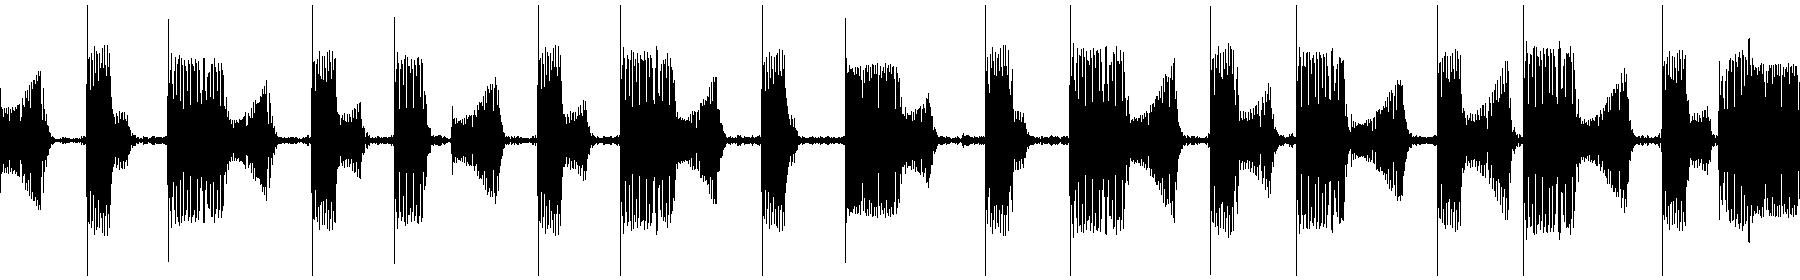 pth bass 19b